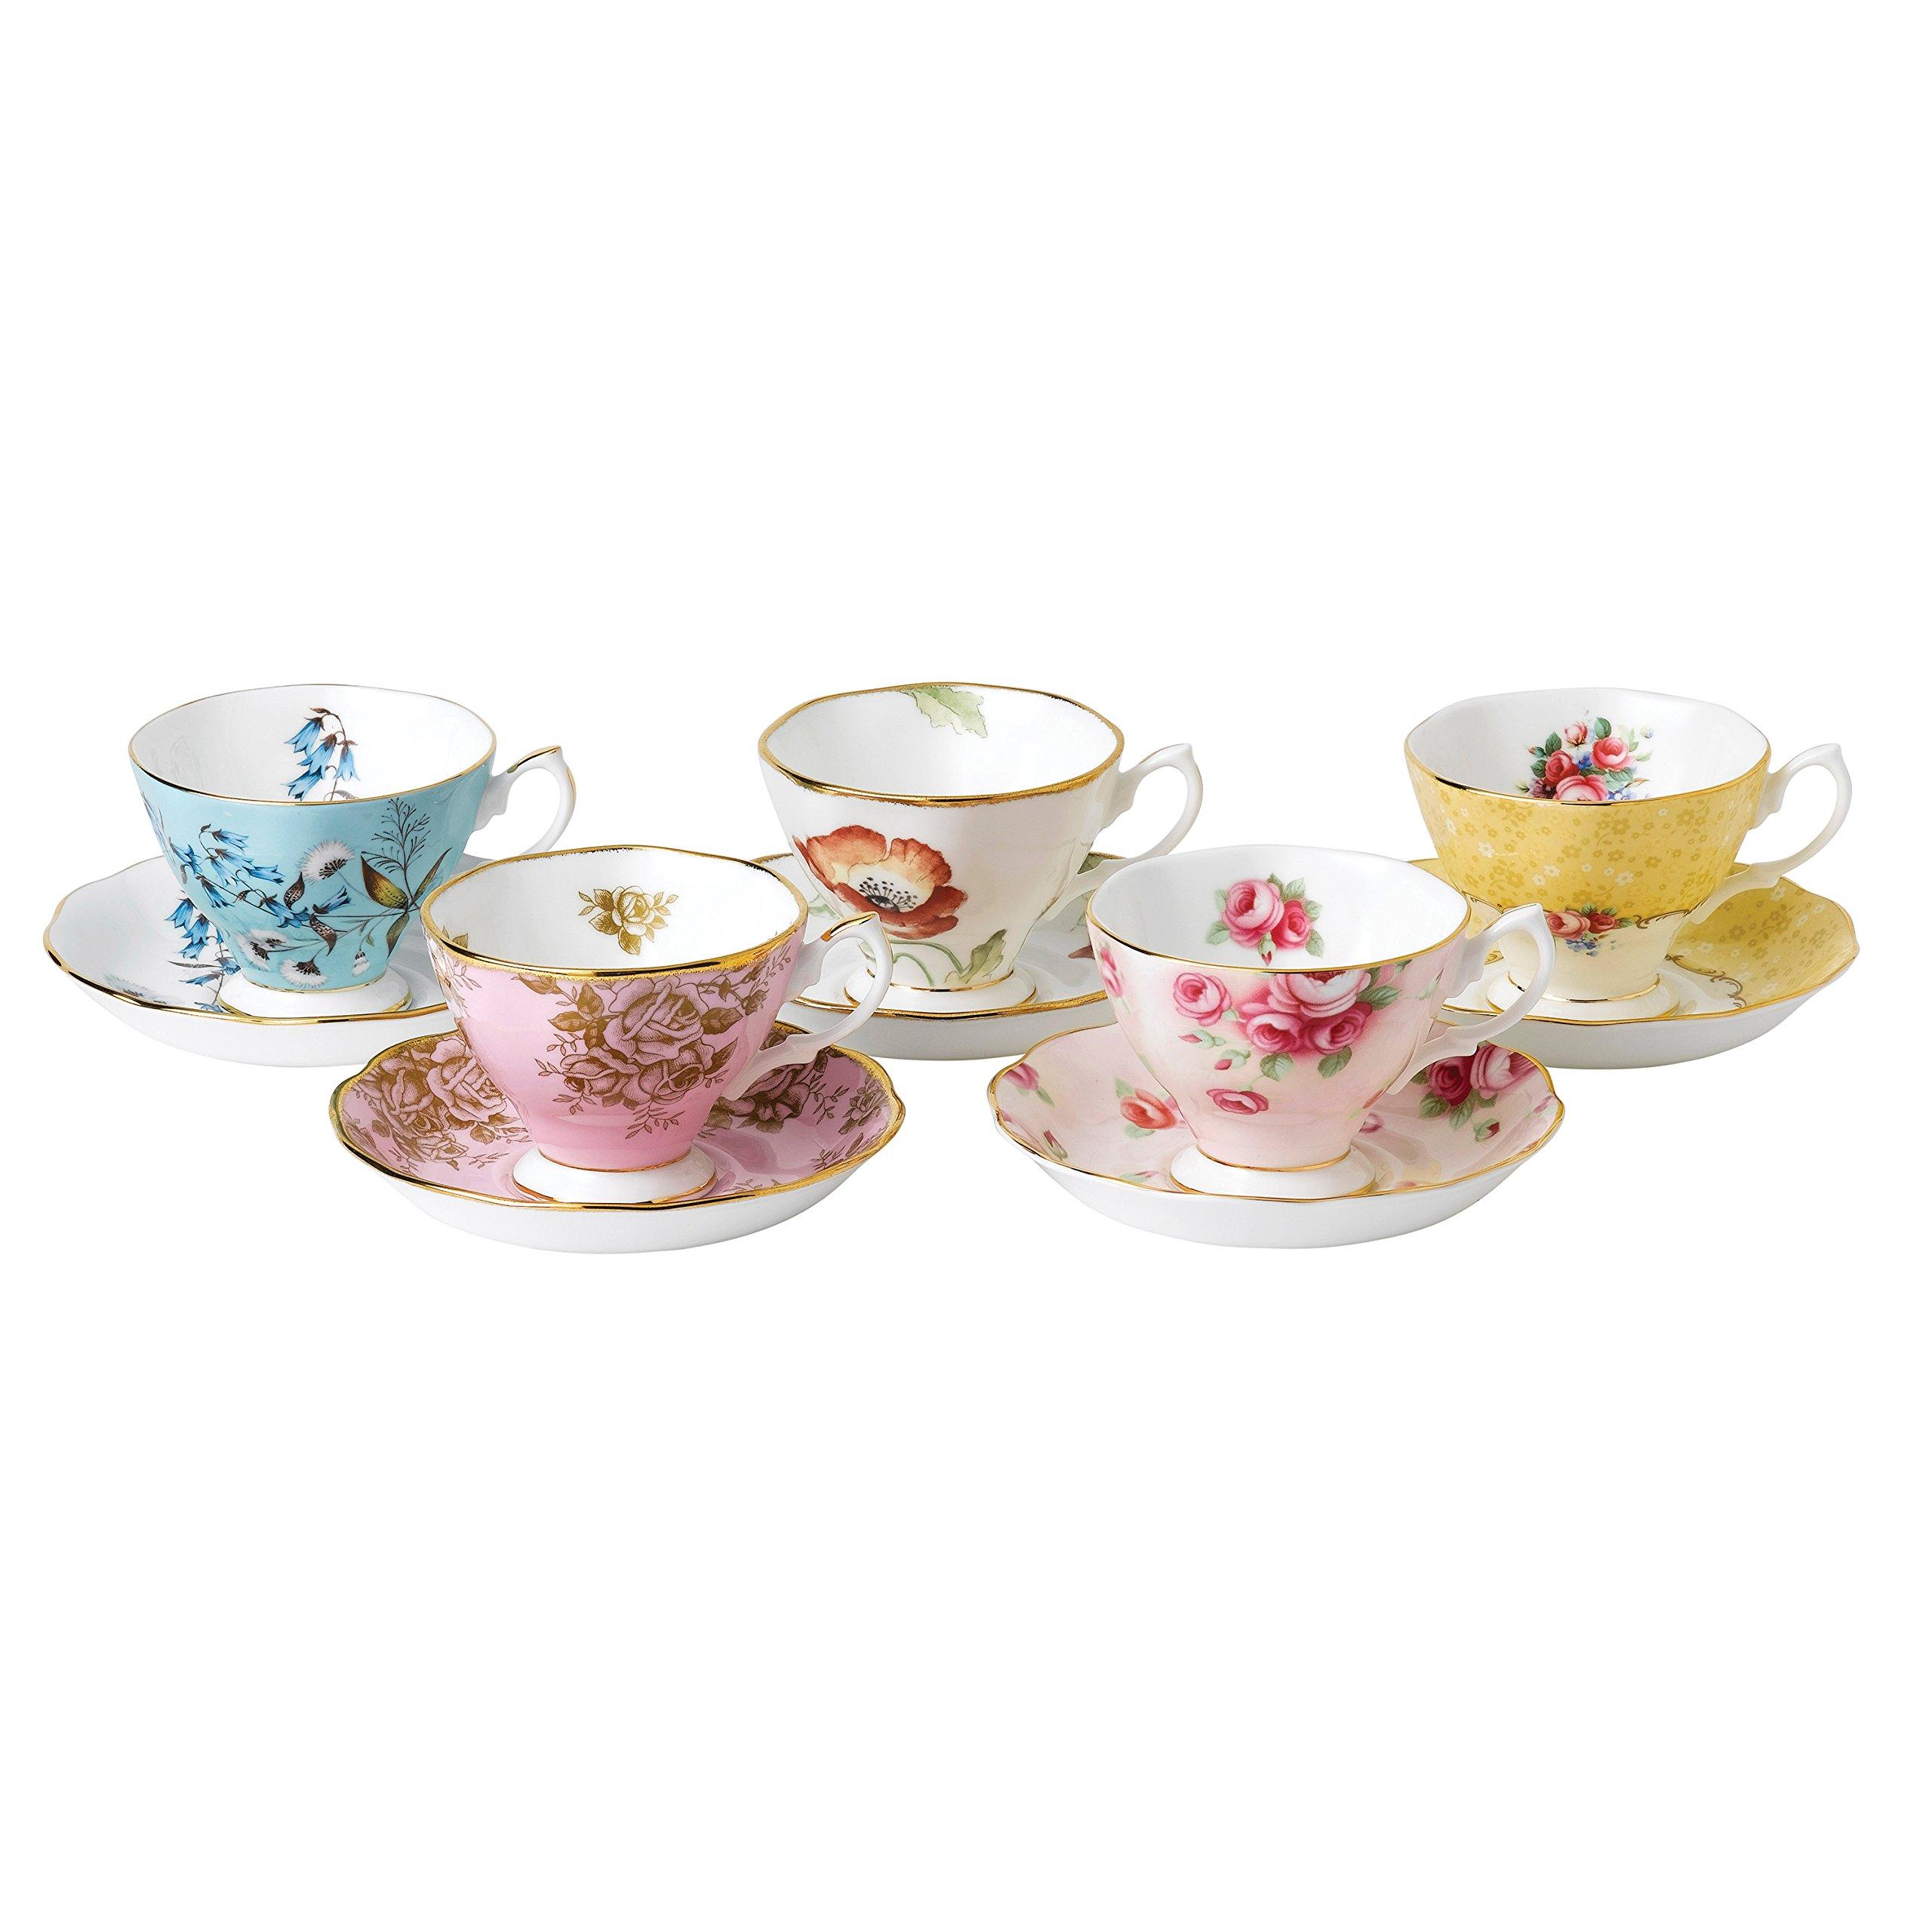 Royal Albert 40017548 100 Years 1950-1990 Teacup & Saucer Set, Multicolor , 5 Piece